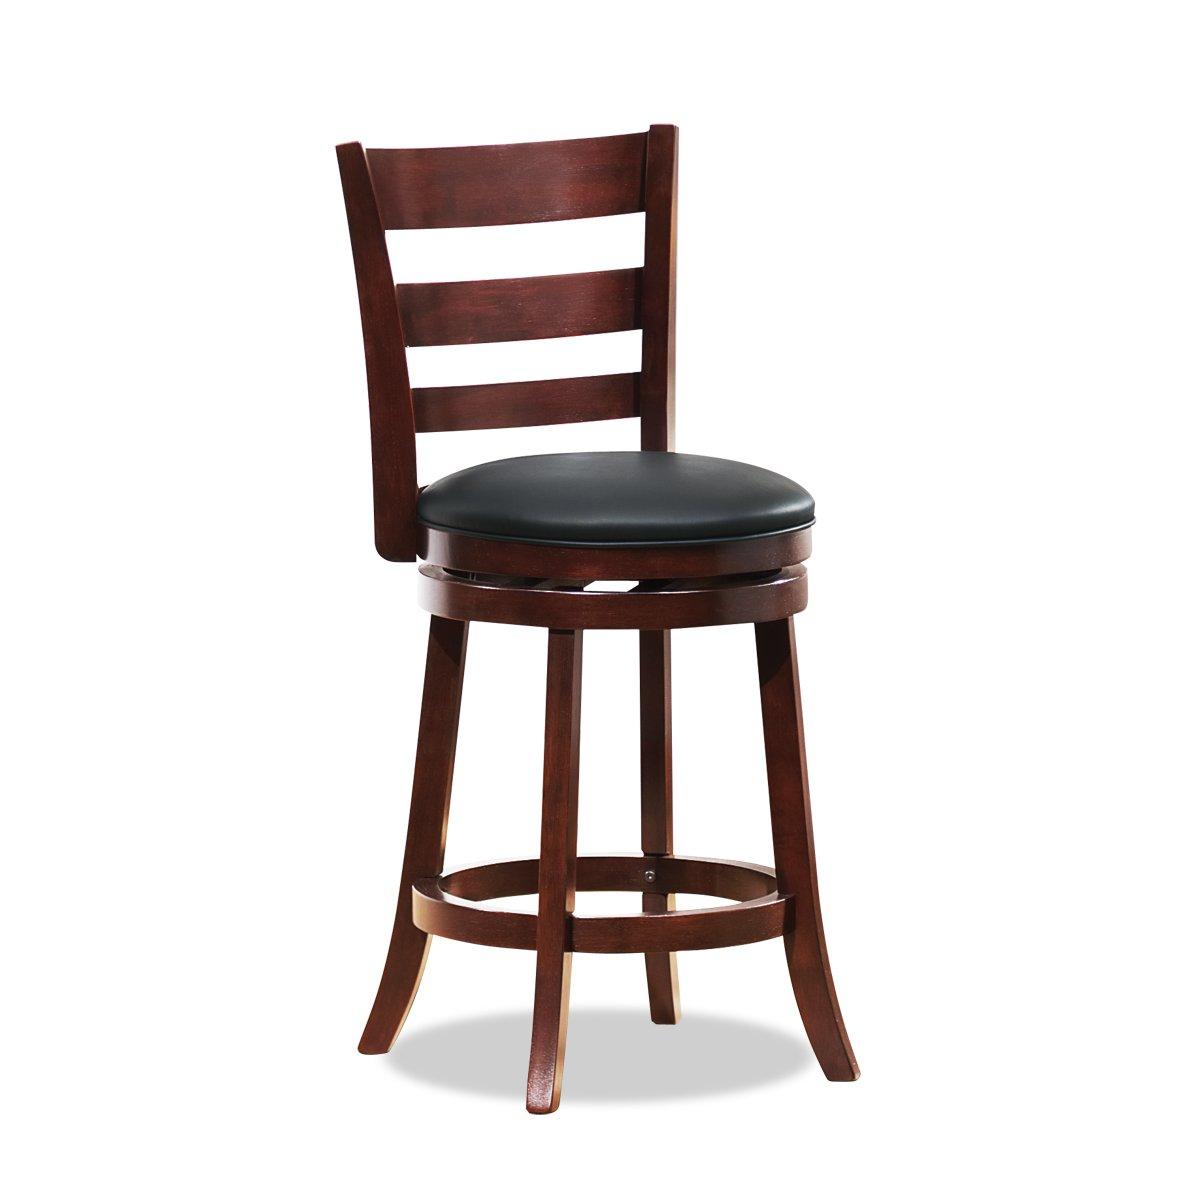 Harper 24 Inch Bar Stool Swivel Counter Stools Bar Stools 24 Inch Bar Stools Bar stools 24 inch